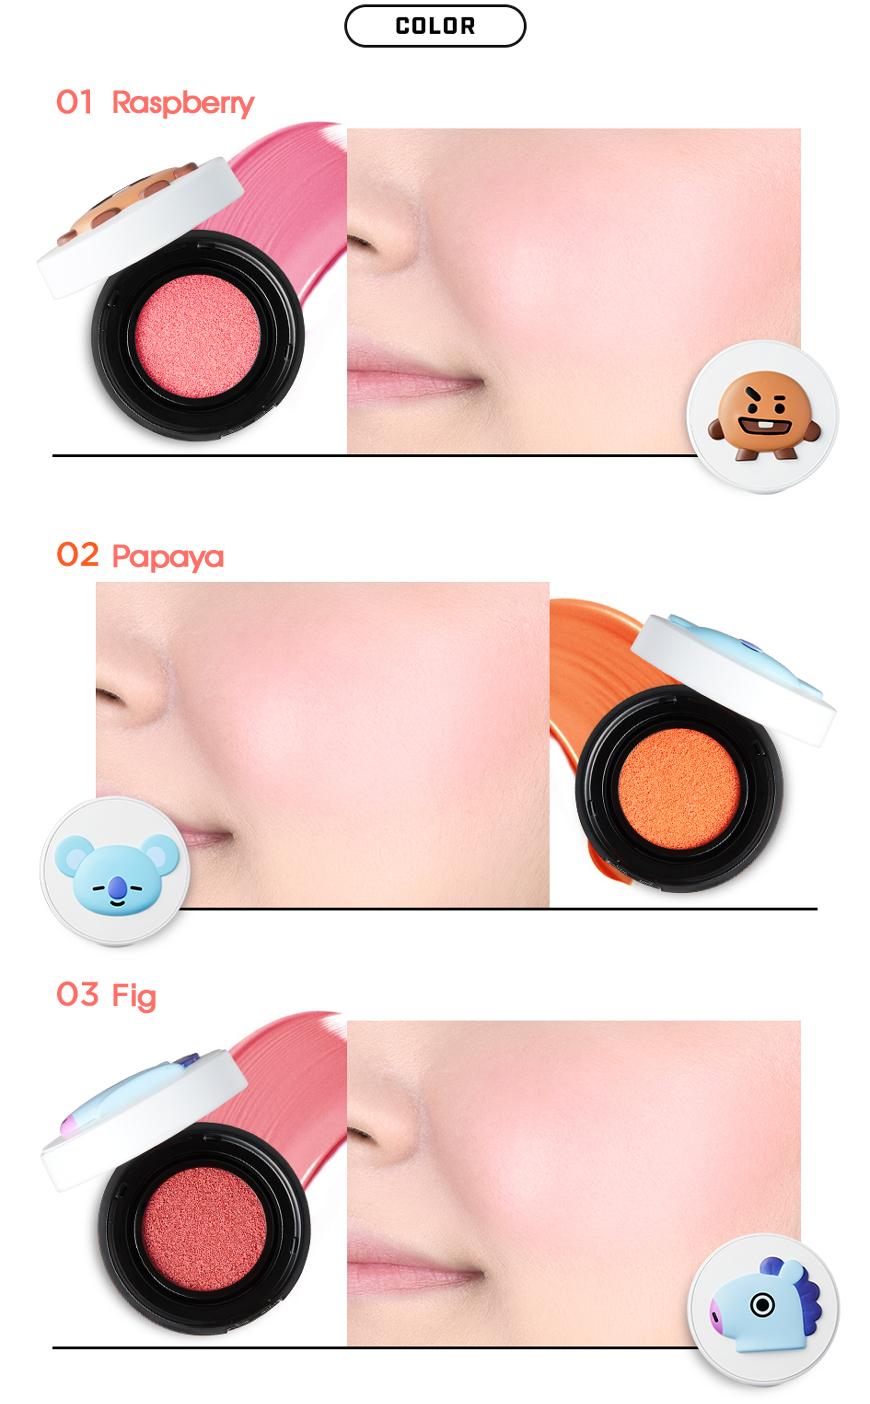 Details about VT Cosmetics BT21 Cheek Cushion 6g 0 21 oz BTS Cosmetics